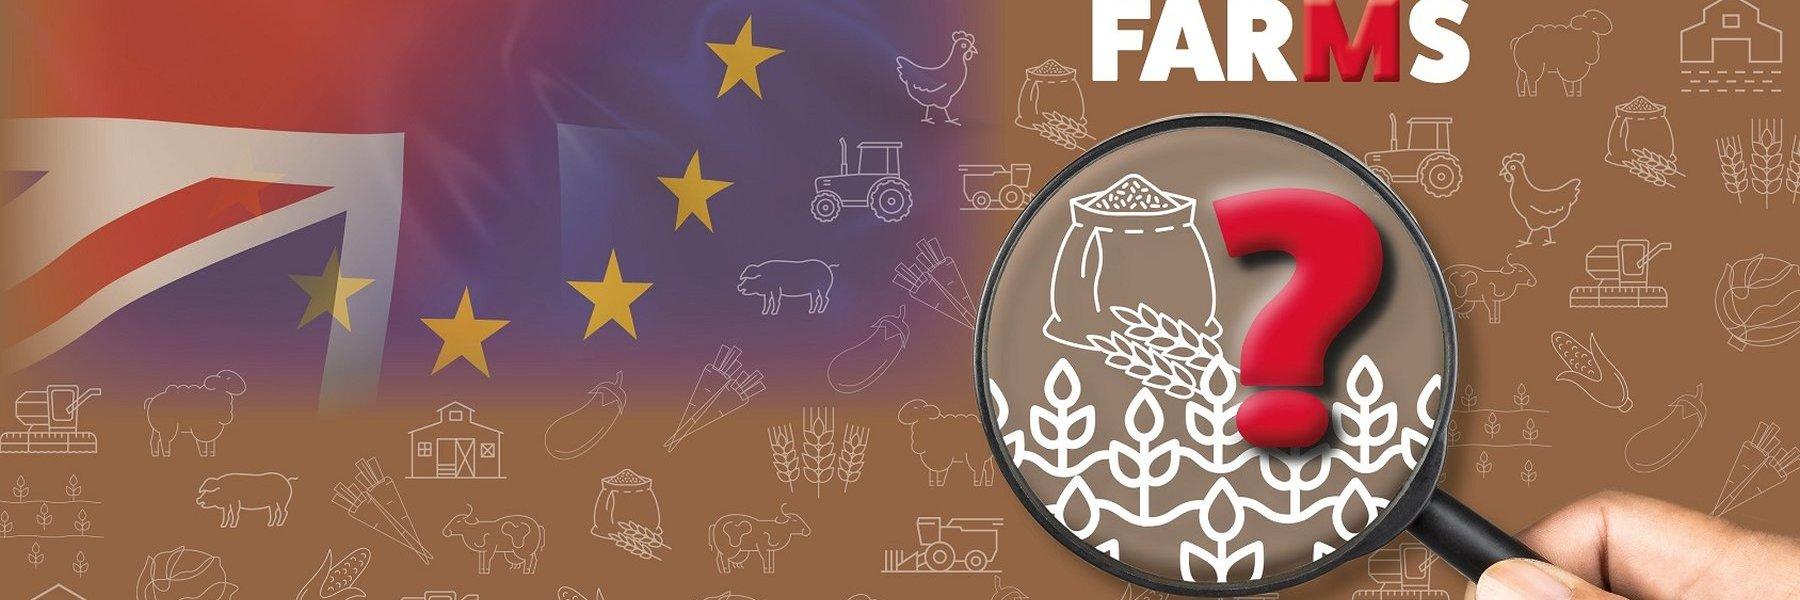 GM Freeze Safeguard Our Farms